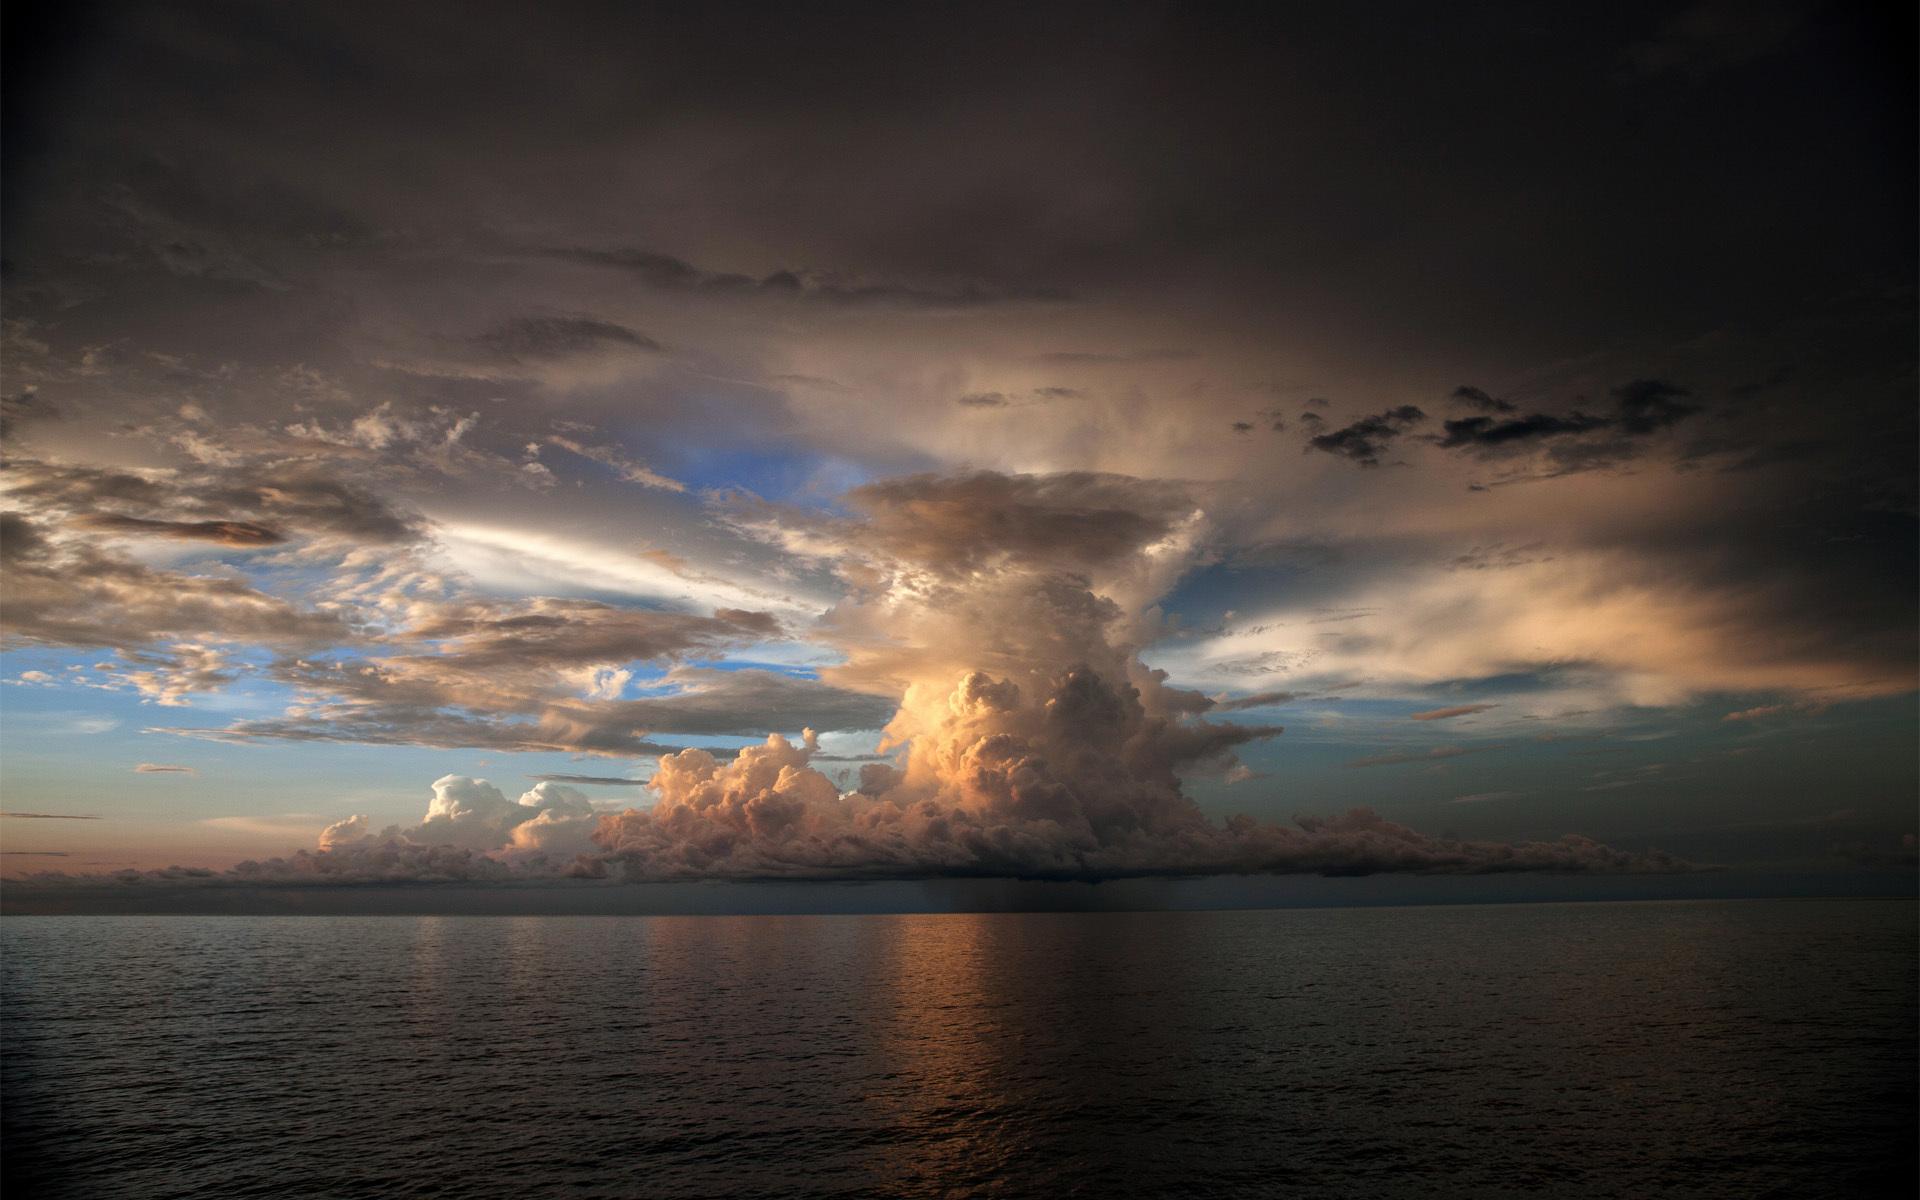 Thunderstorm Backgrounds - WallpaperSafari